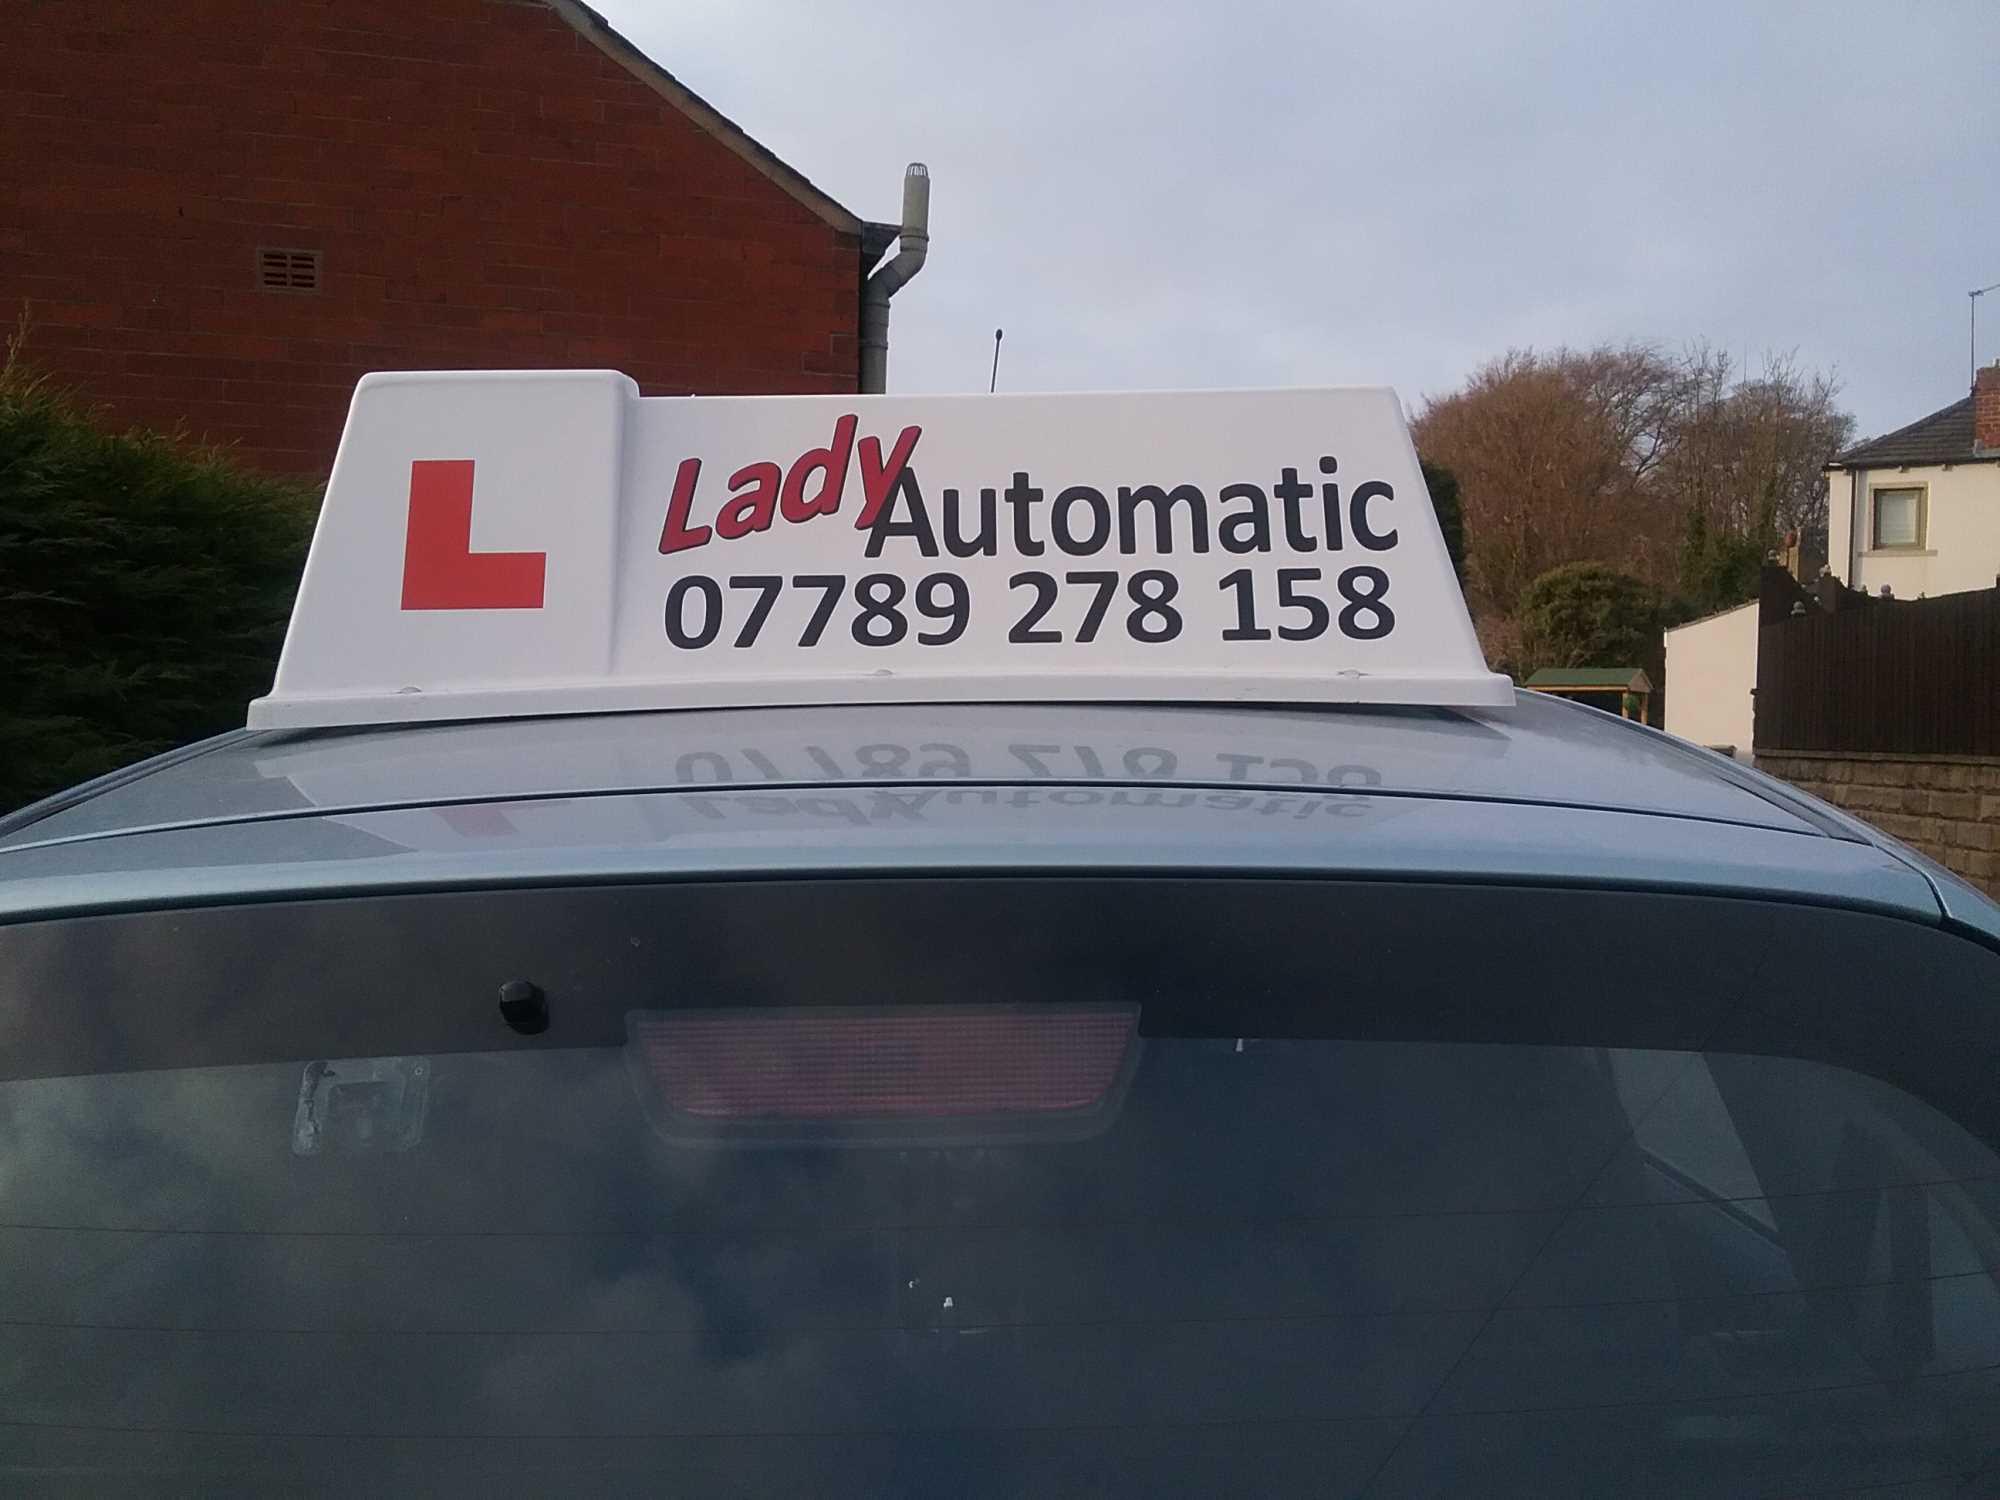 Lady Automatic